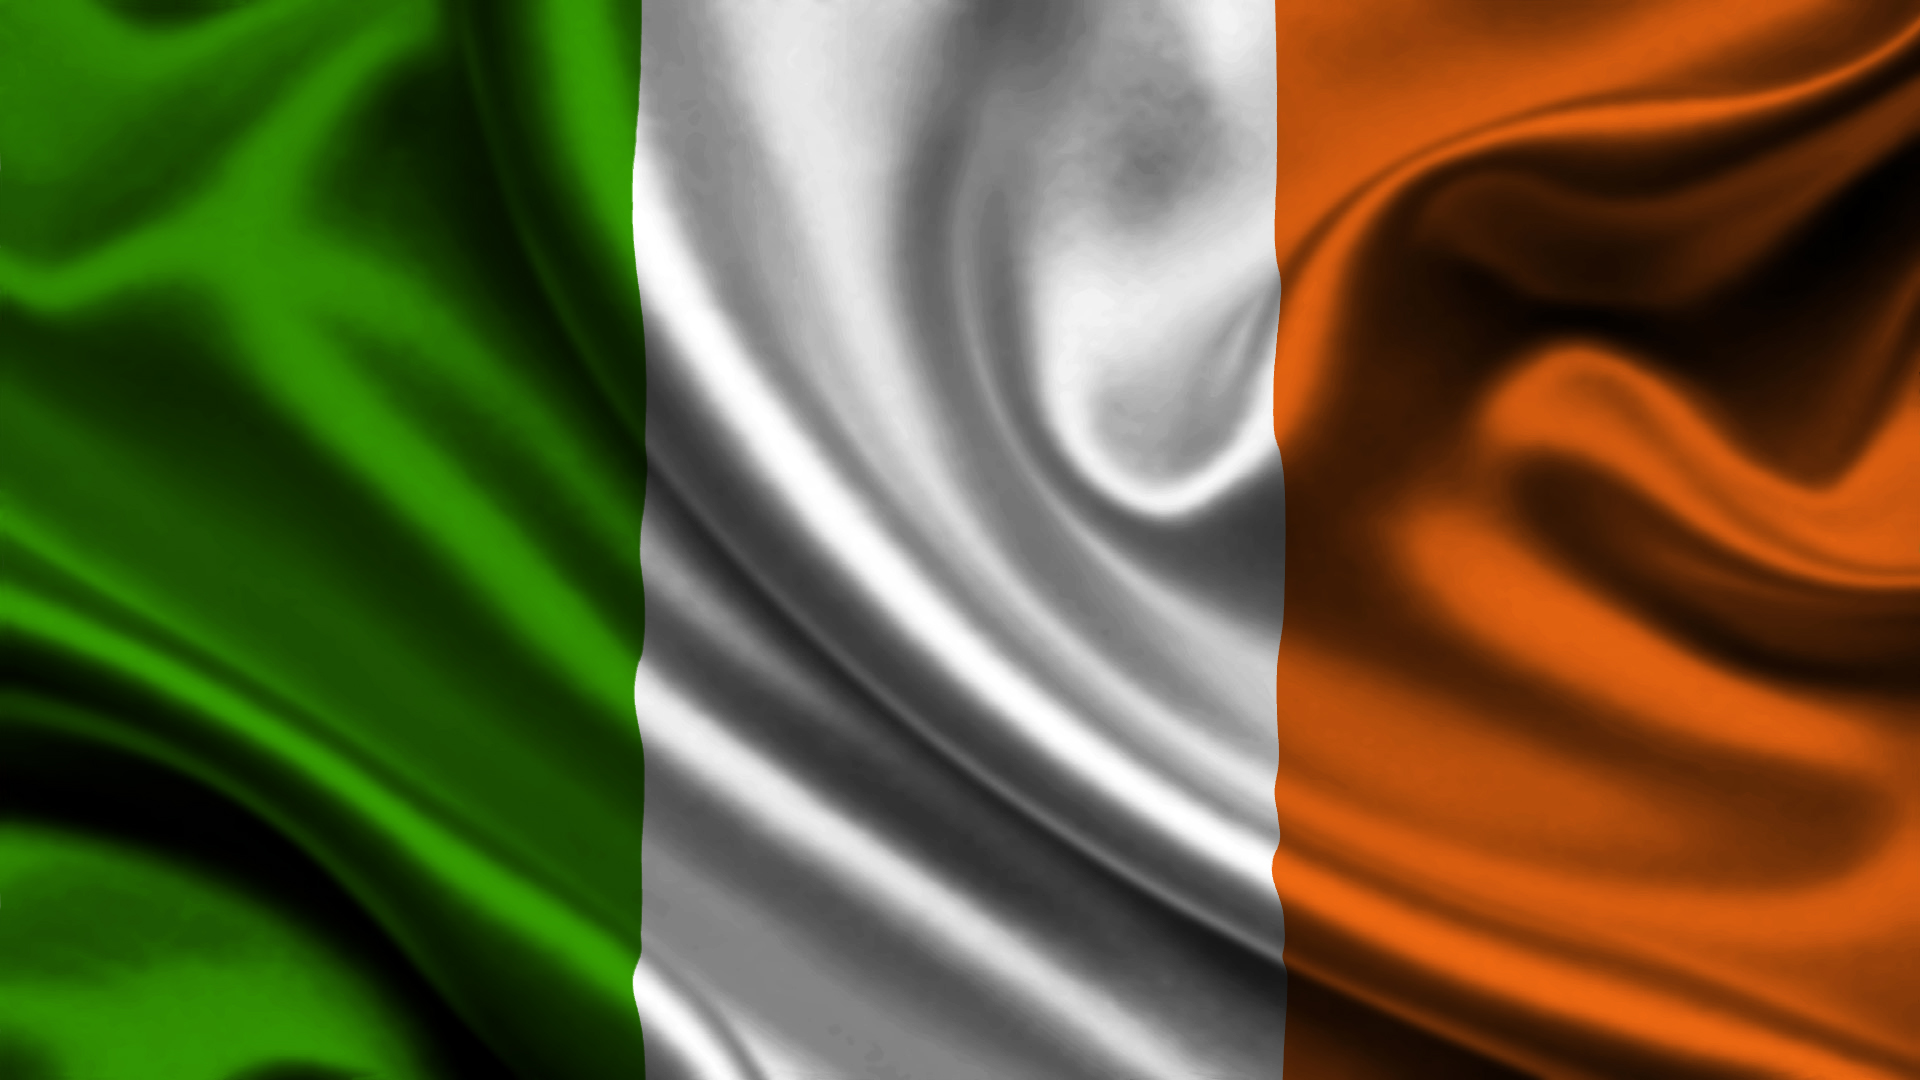 Photo Ireland Flag Stripes 1920x1080 1920x1080